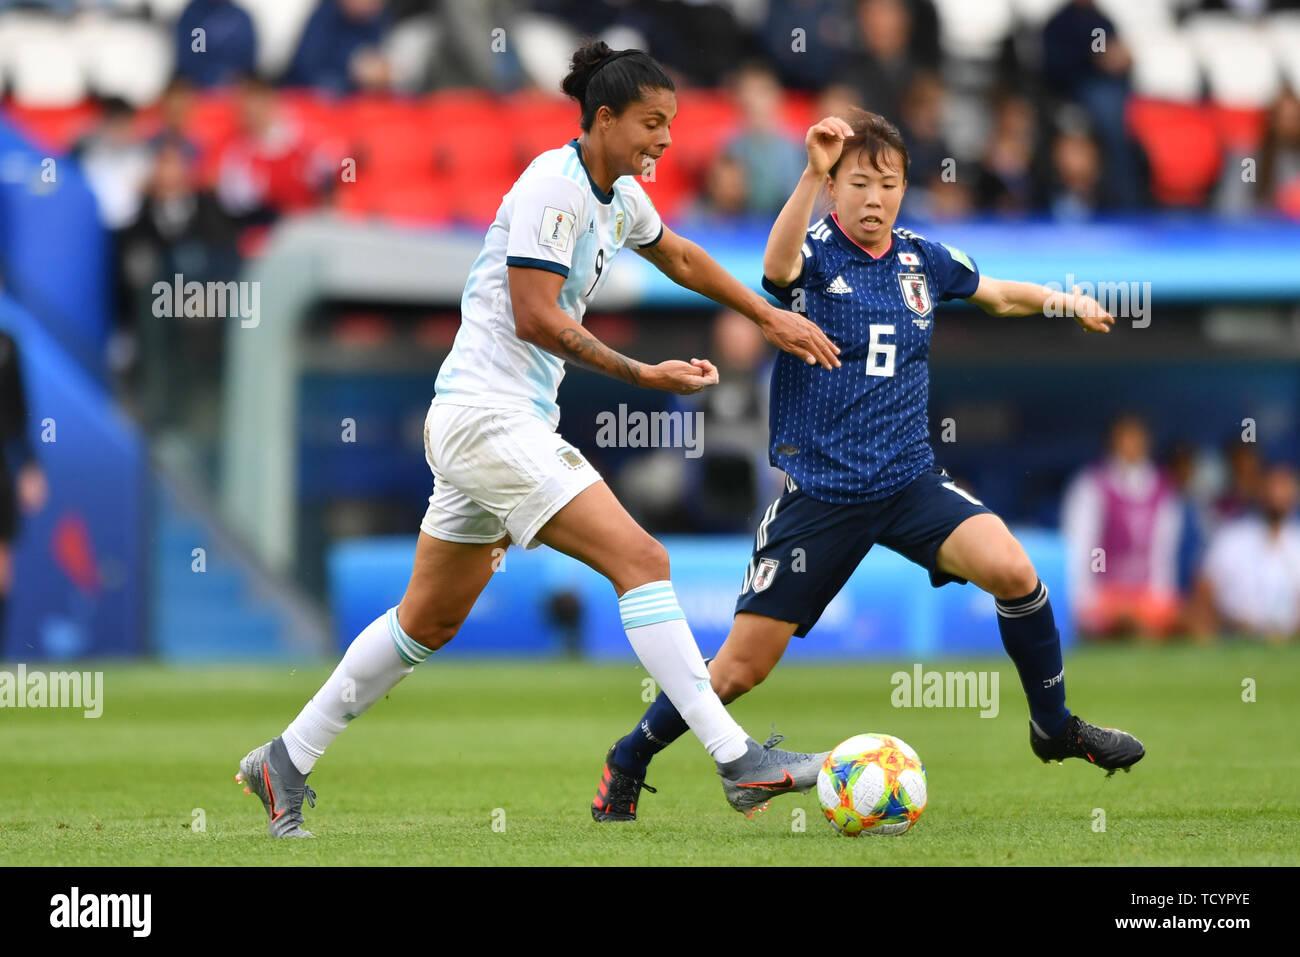 10 june 2019 Paris, France Soccer Women's World Cup France 2019: Argentina v Japan   Florencia Soledad Jaimes (Argentinien) (9) helping in the defense - Stock Image